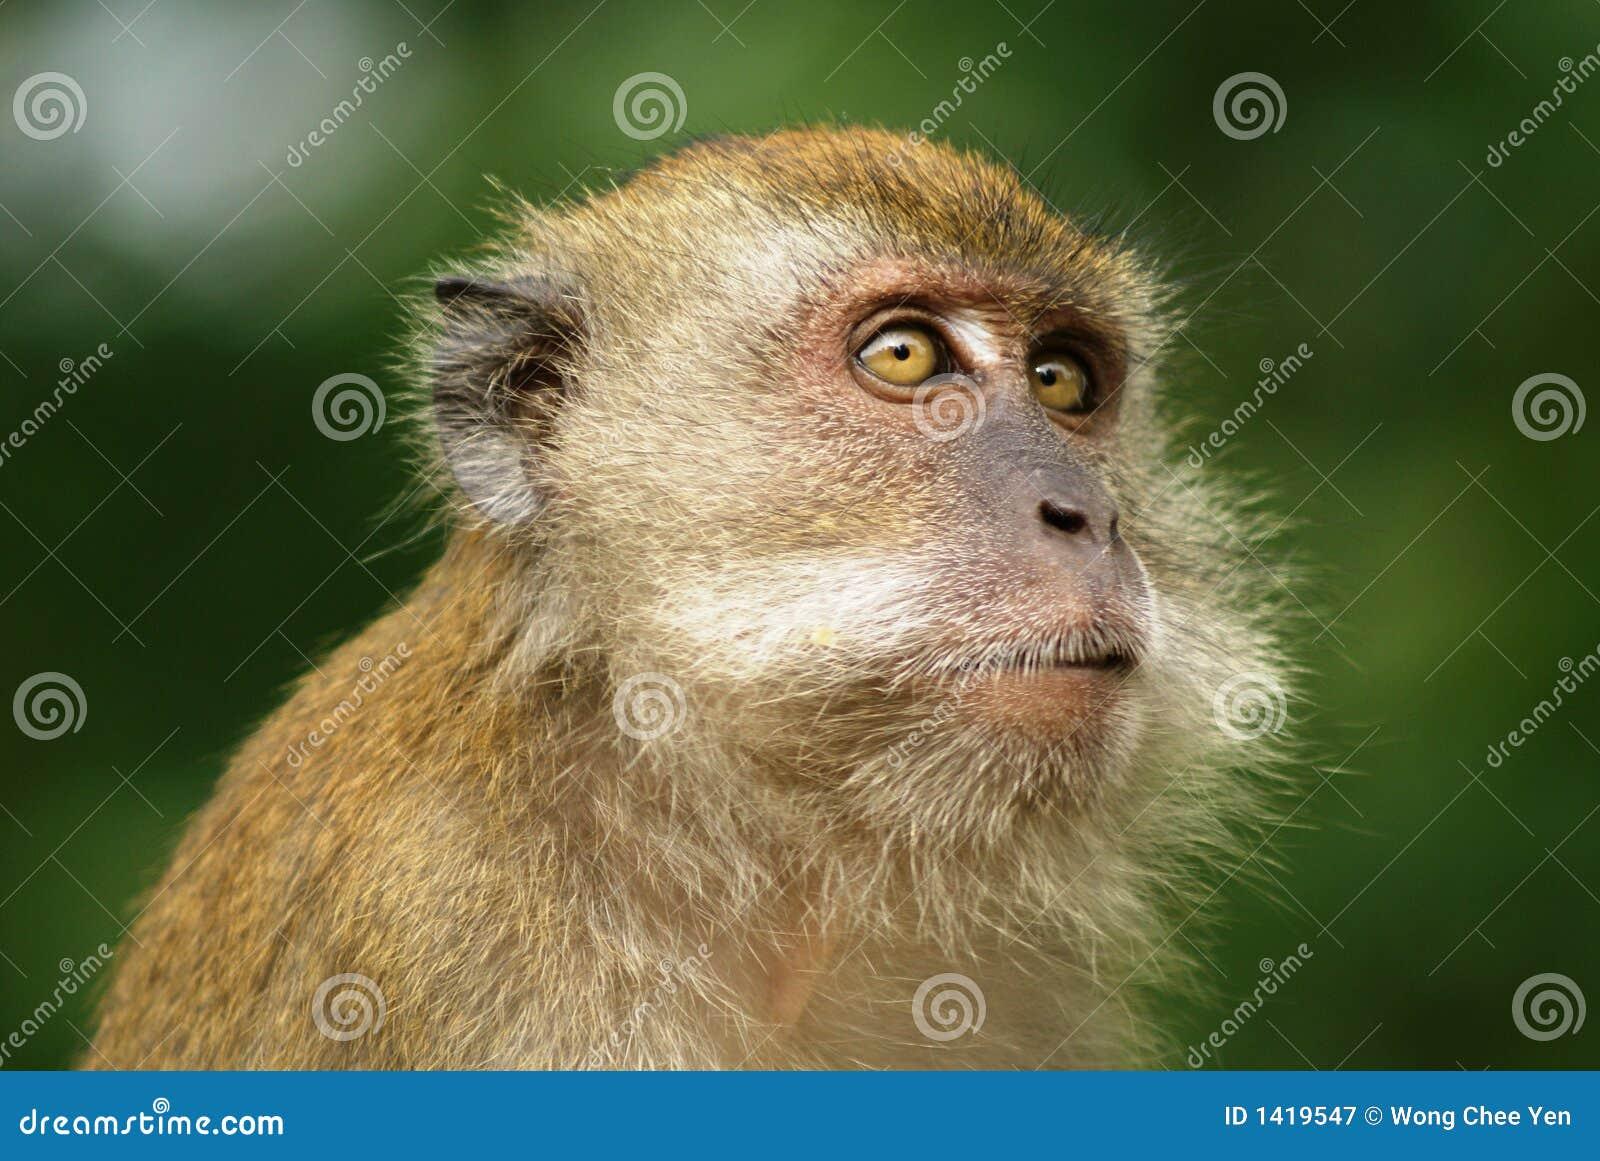 Se macaqueapan